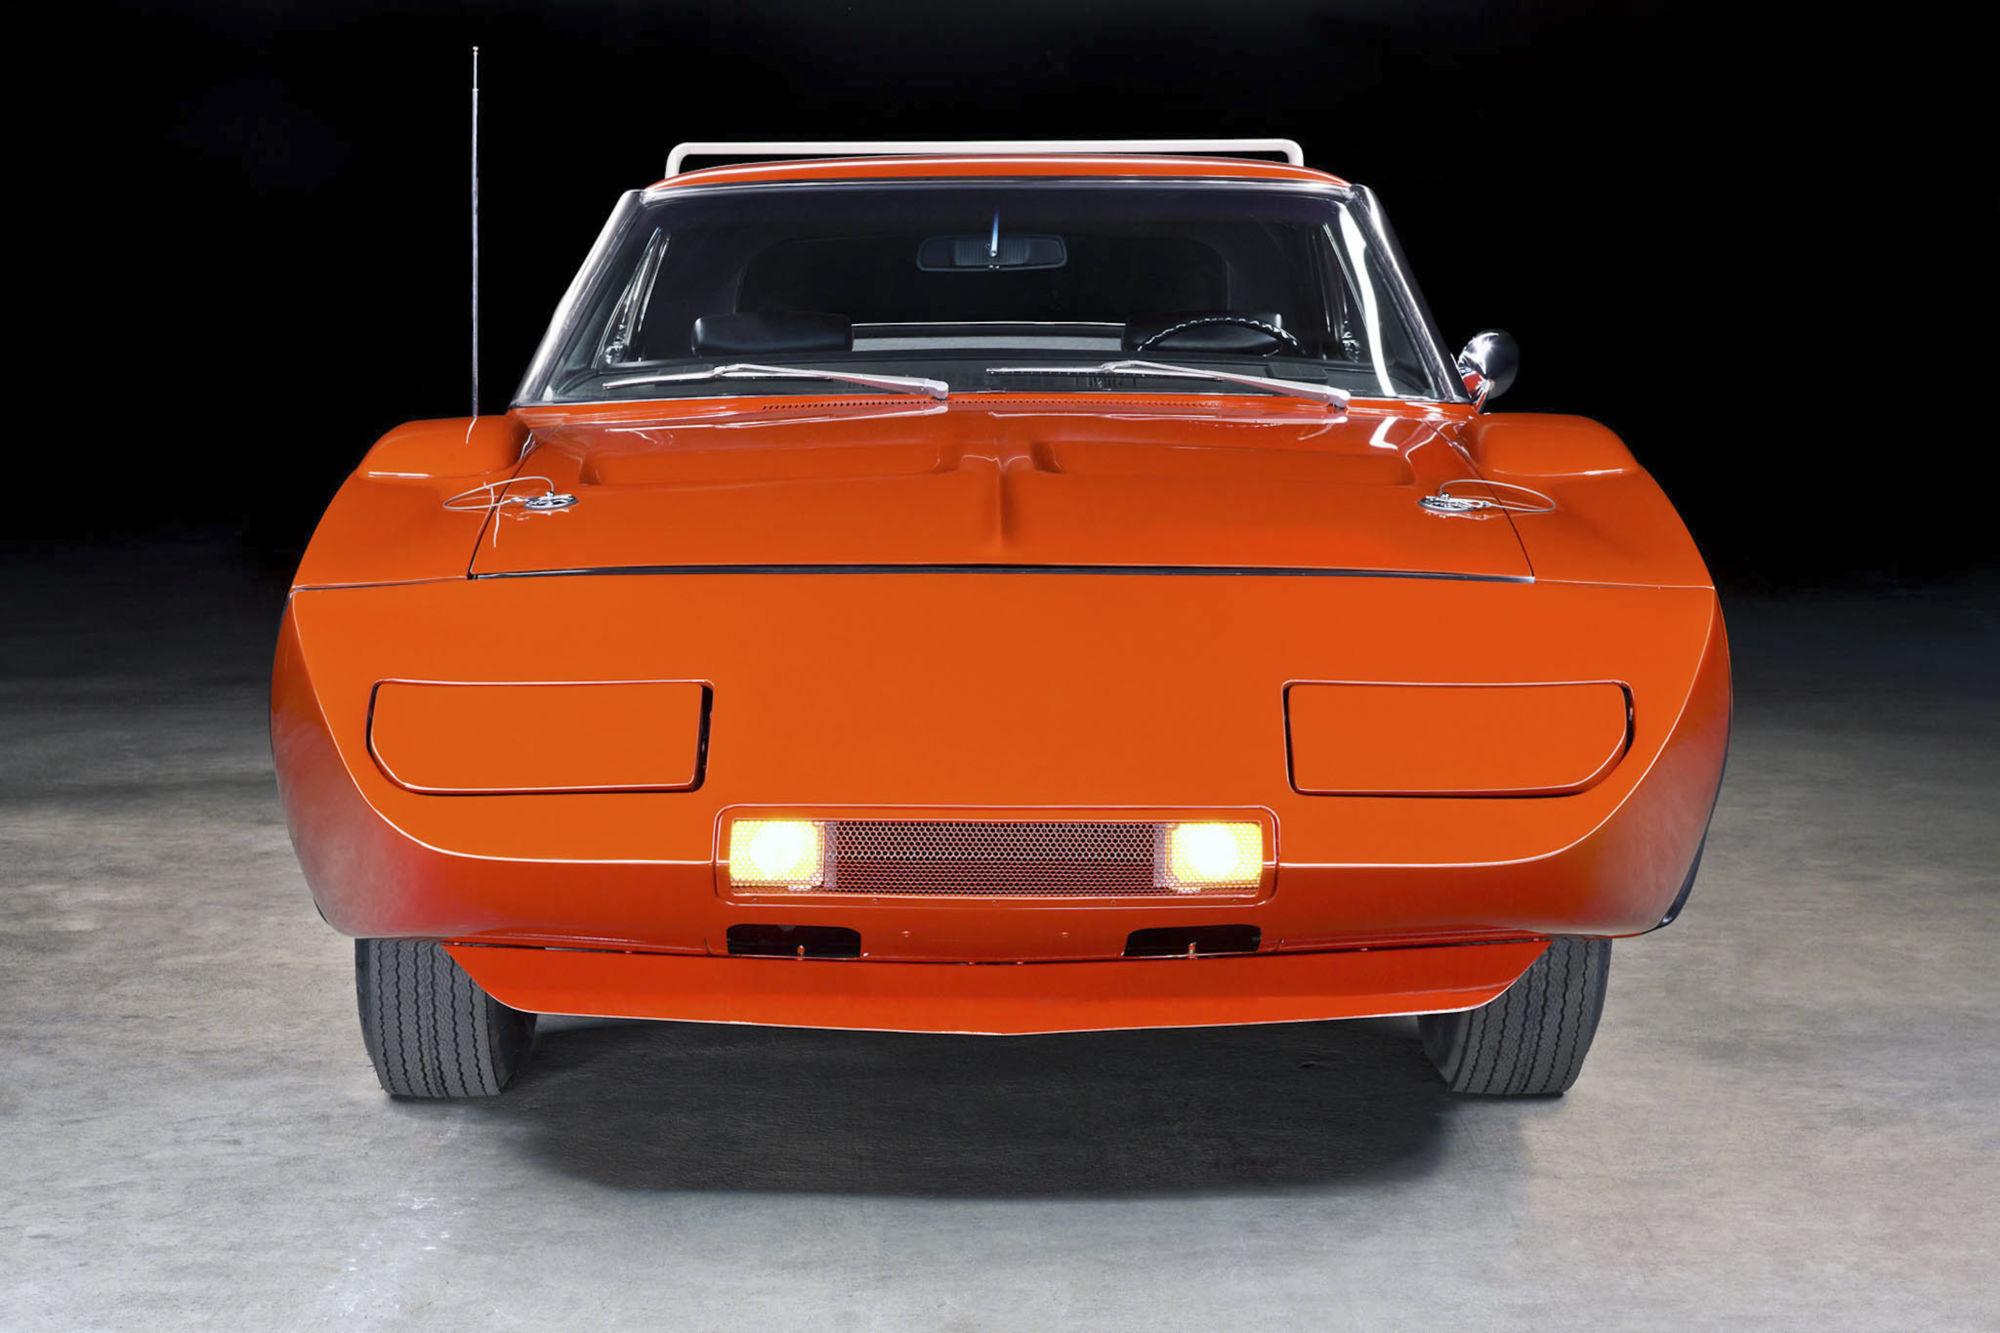 1969 Dodge Charger Daytona American Muscle Car